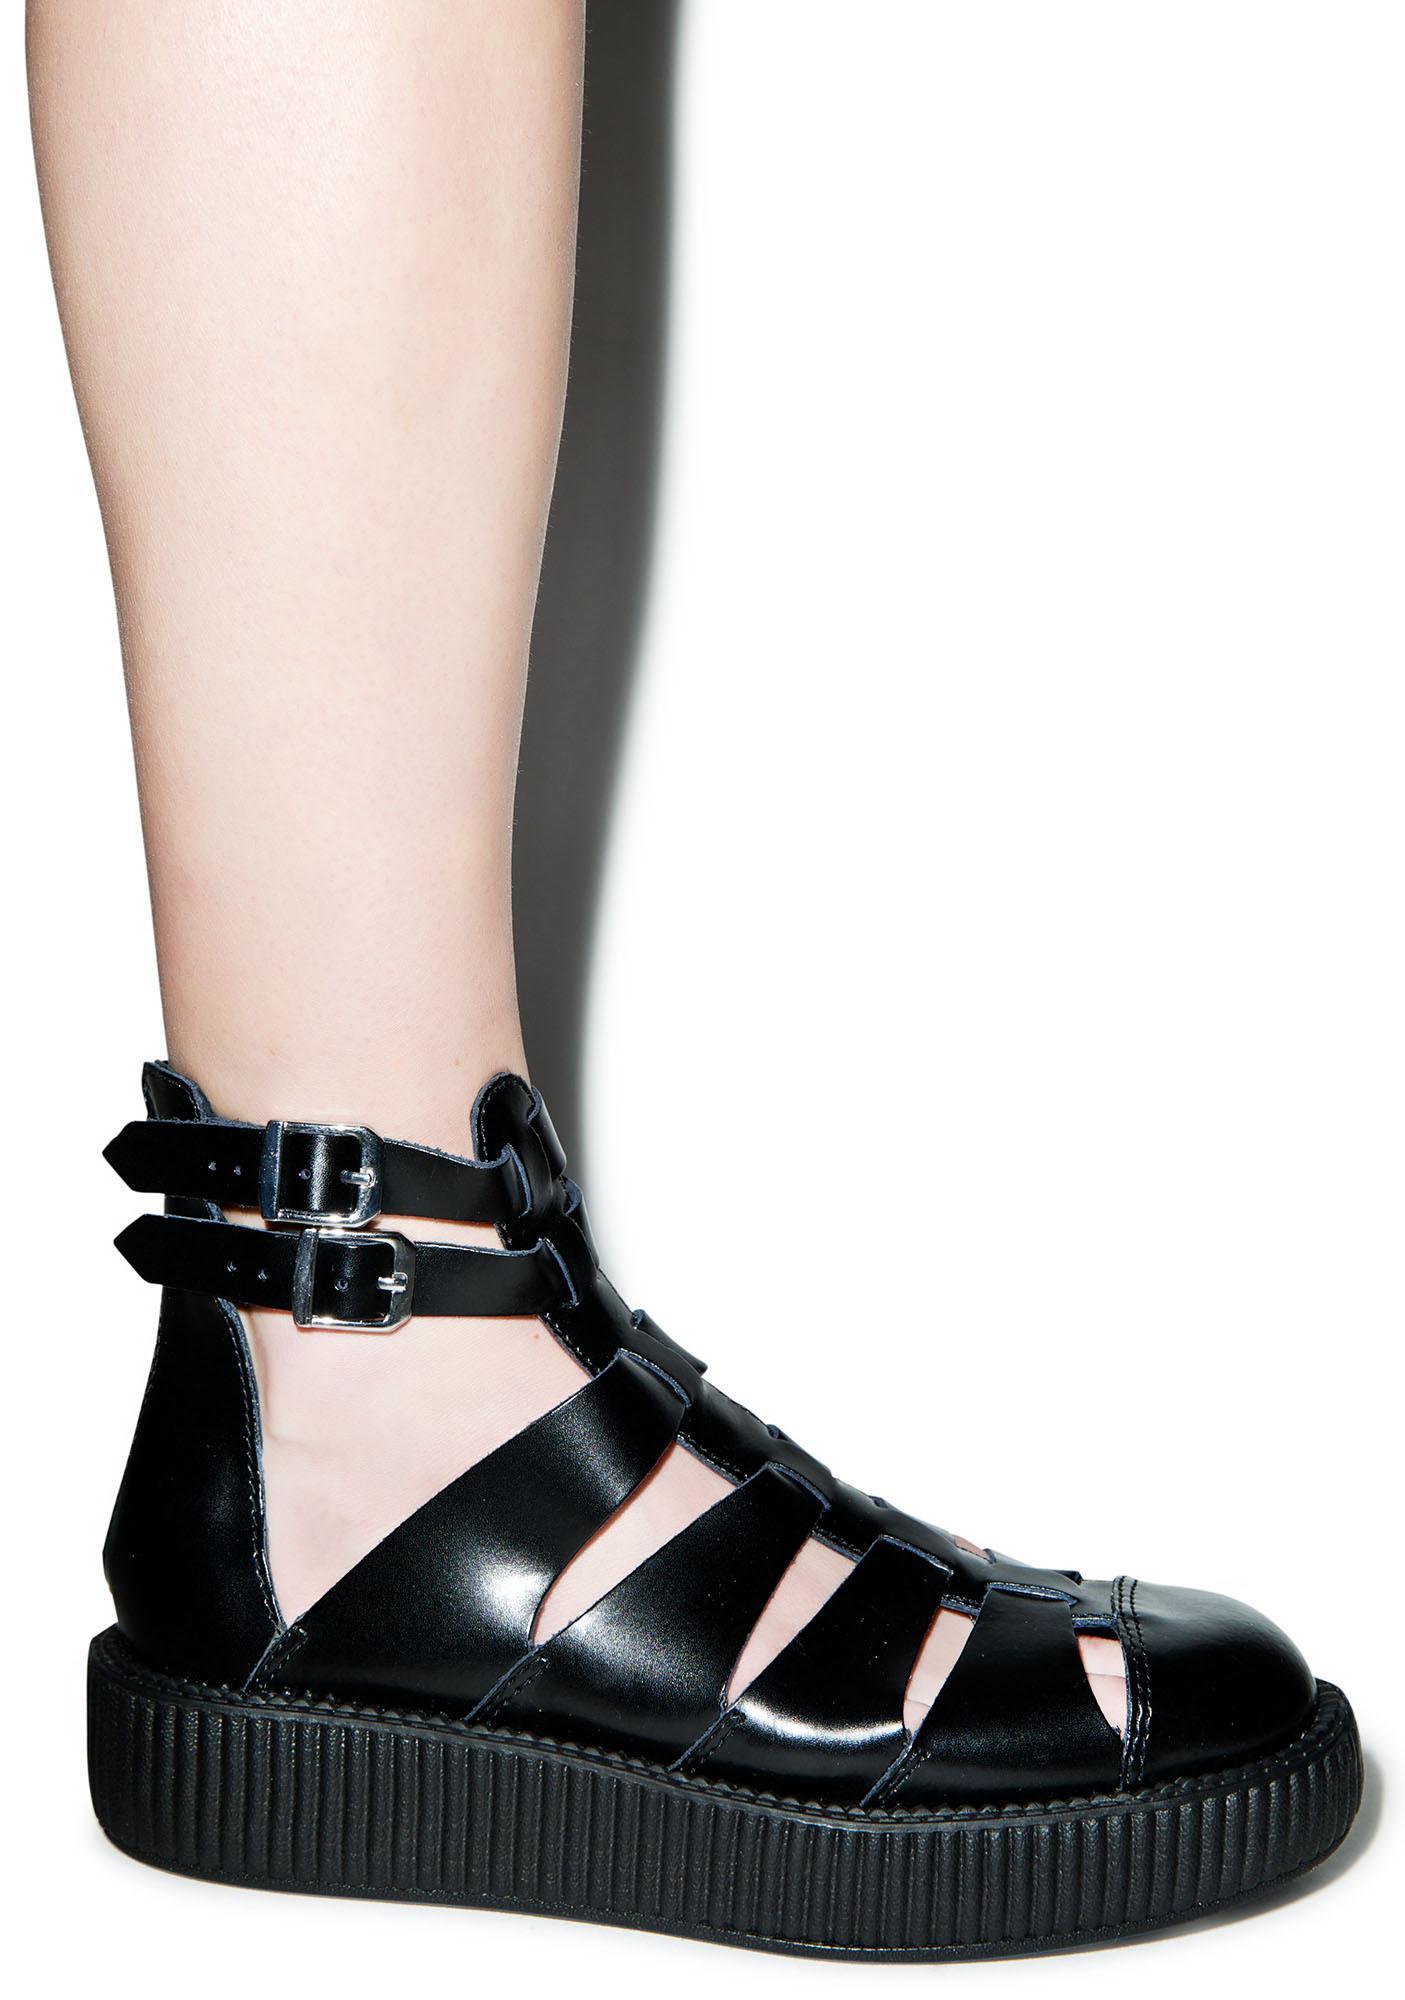 T.U.K. Gladiator Viva Low Sandals